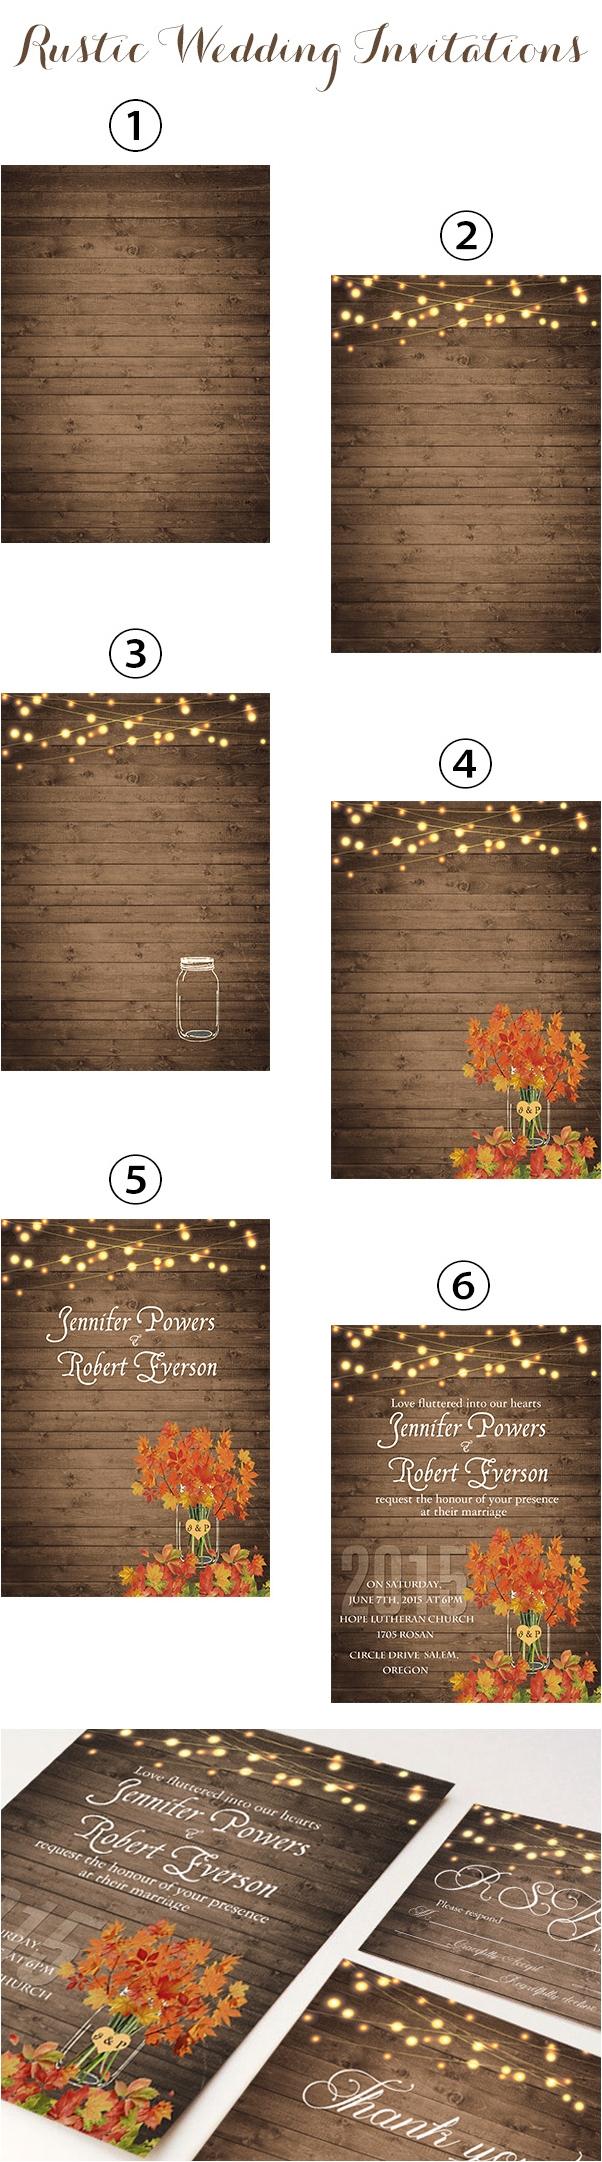 Rustic wedding invitation inspiration for your rustic wedding